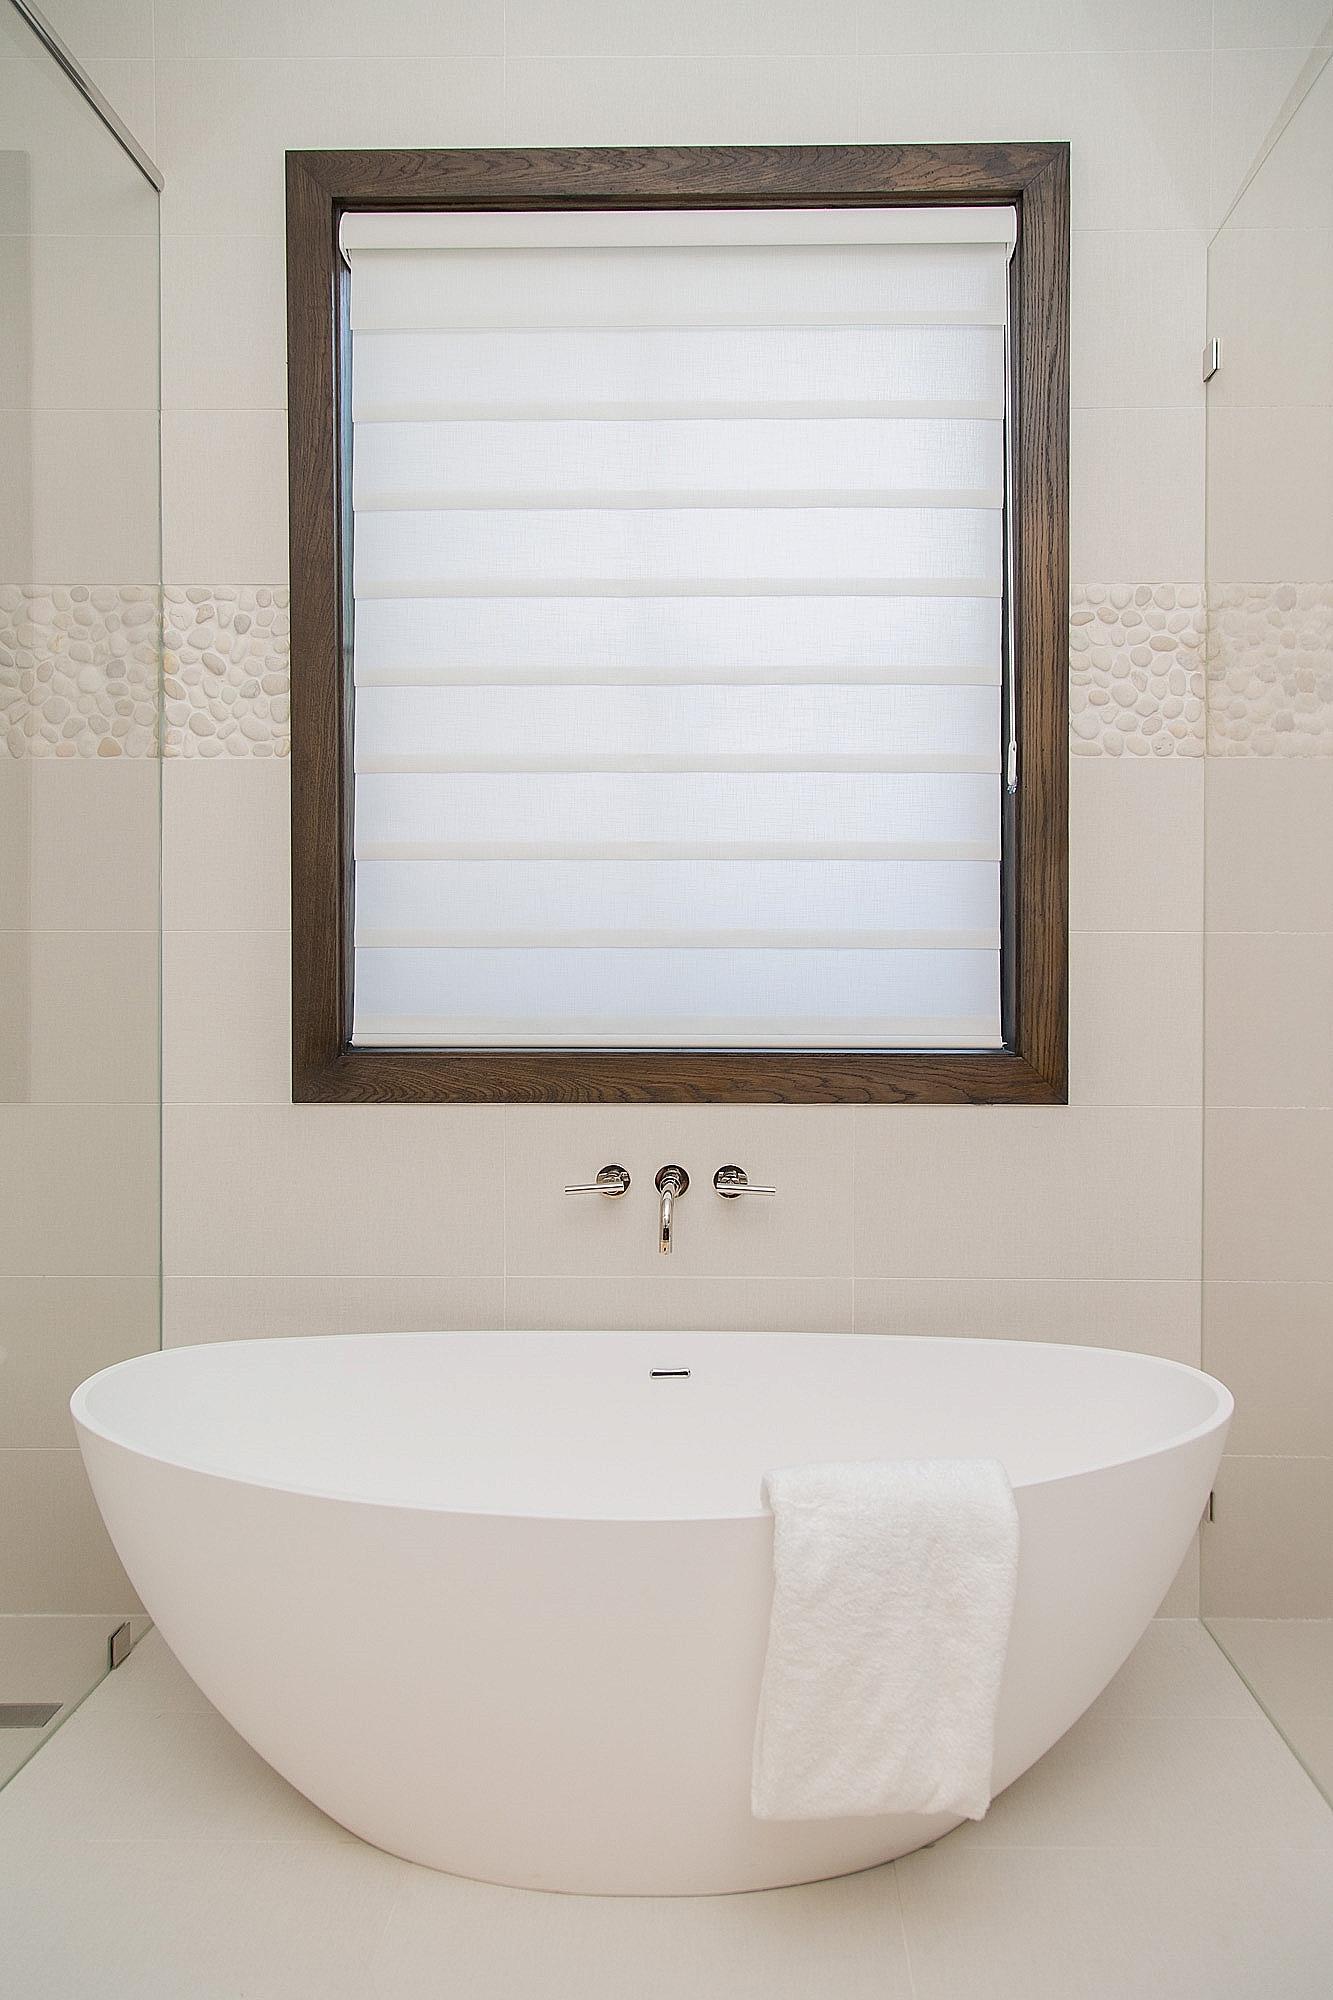 Translucent Roman Shade |  Carla Aston, Designer#windowtreatment #romanshade